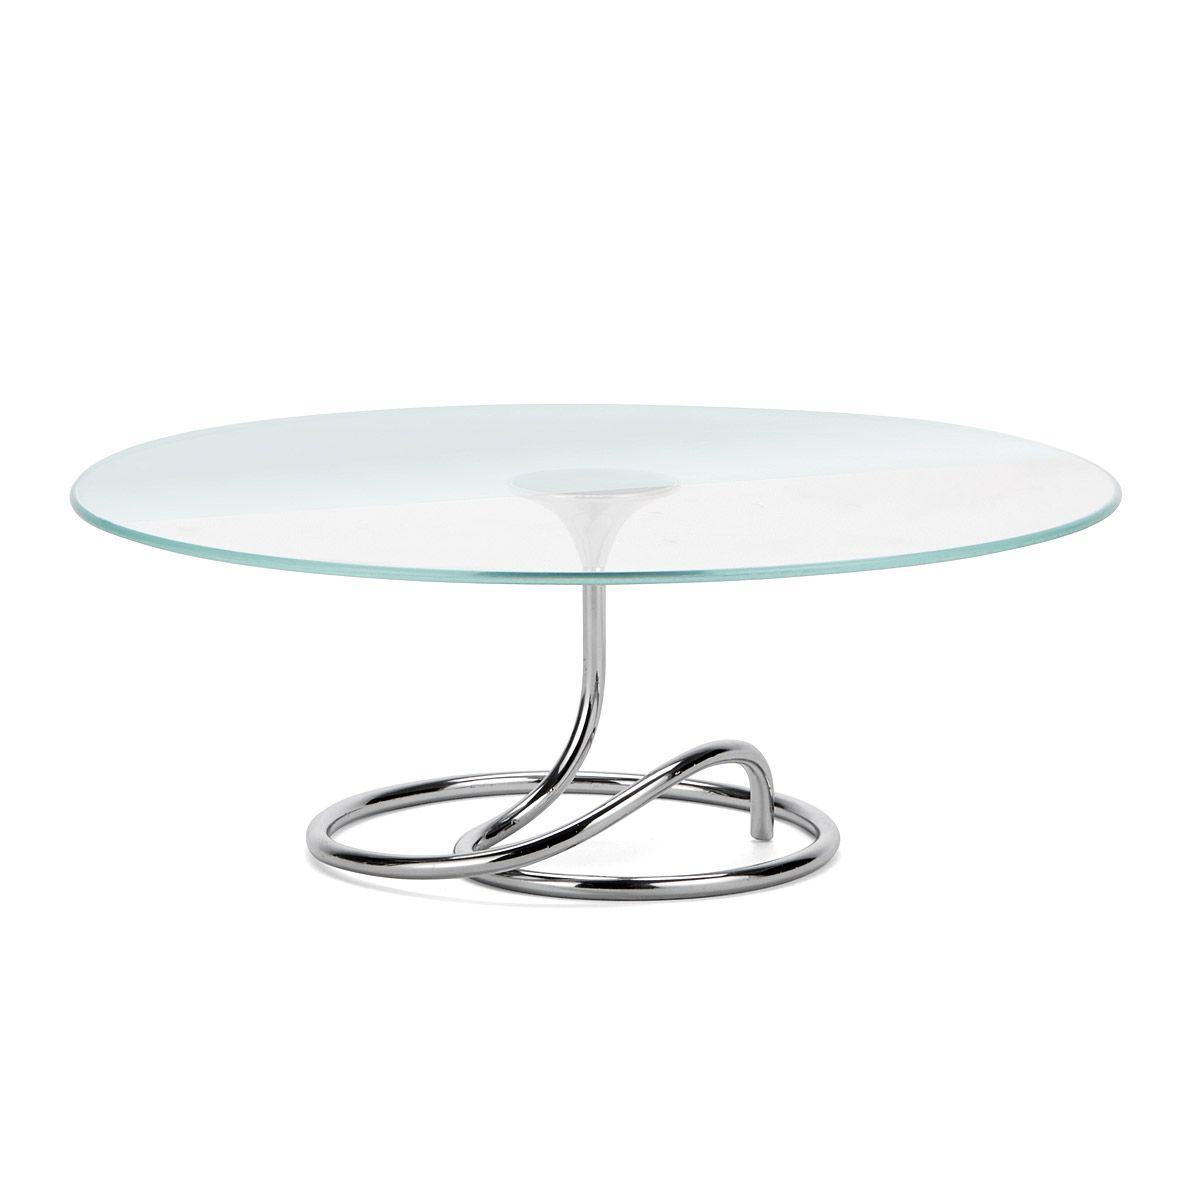 LOOP CAKE STAND | Glass & Metal Dessert Plate | UncommonGoods